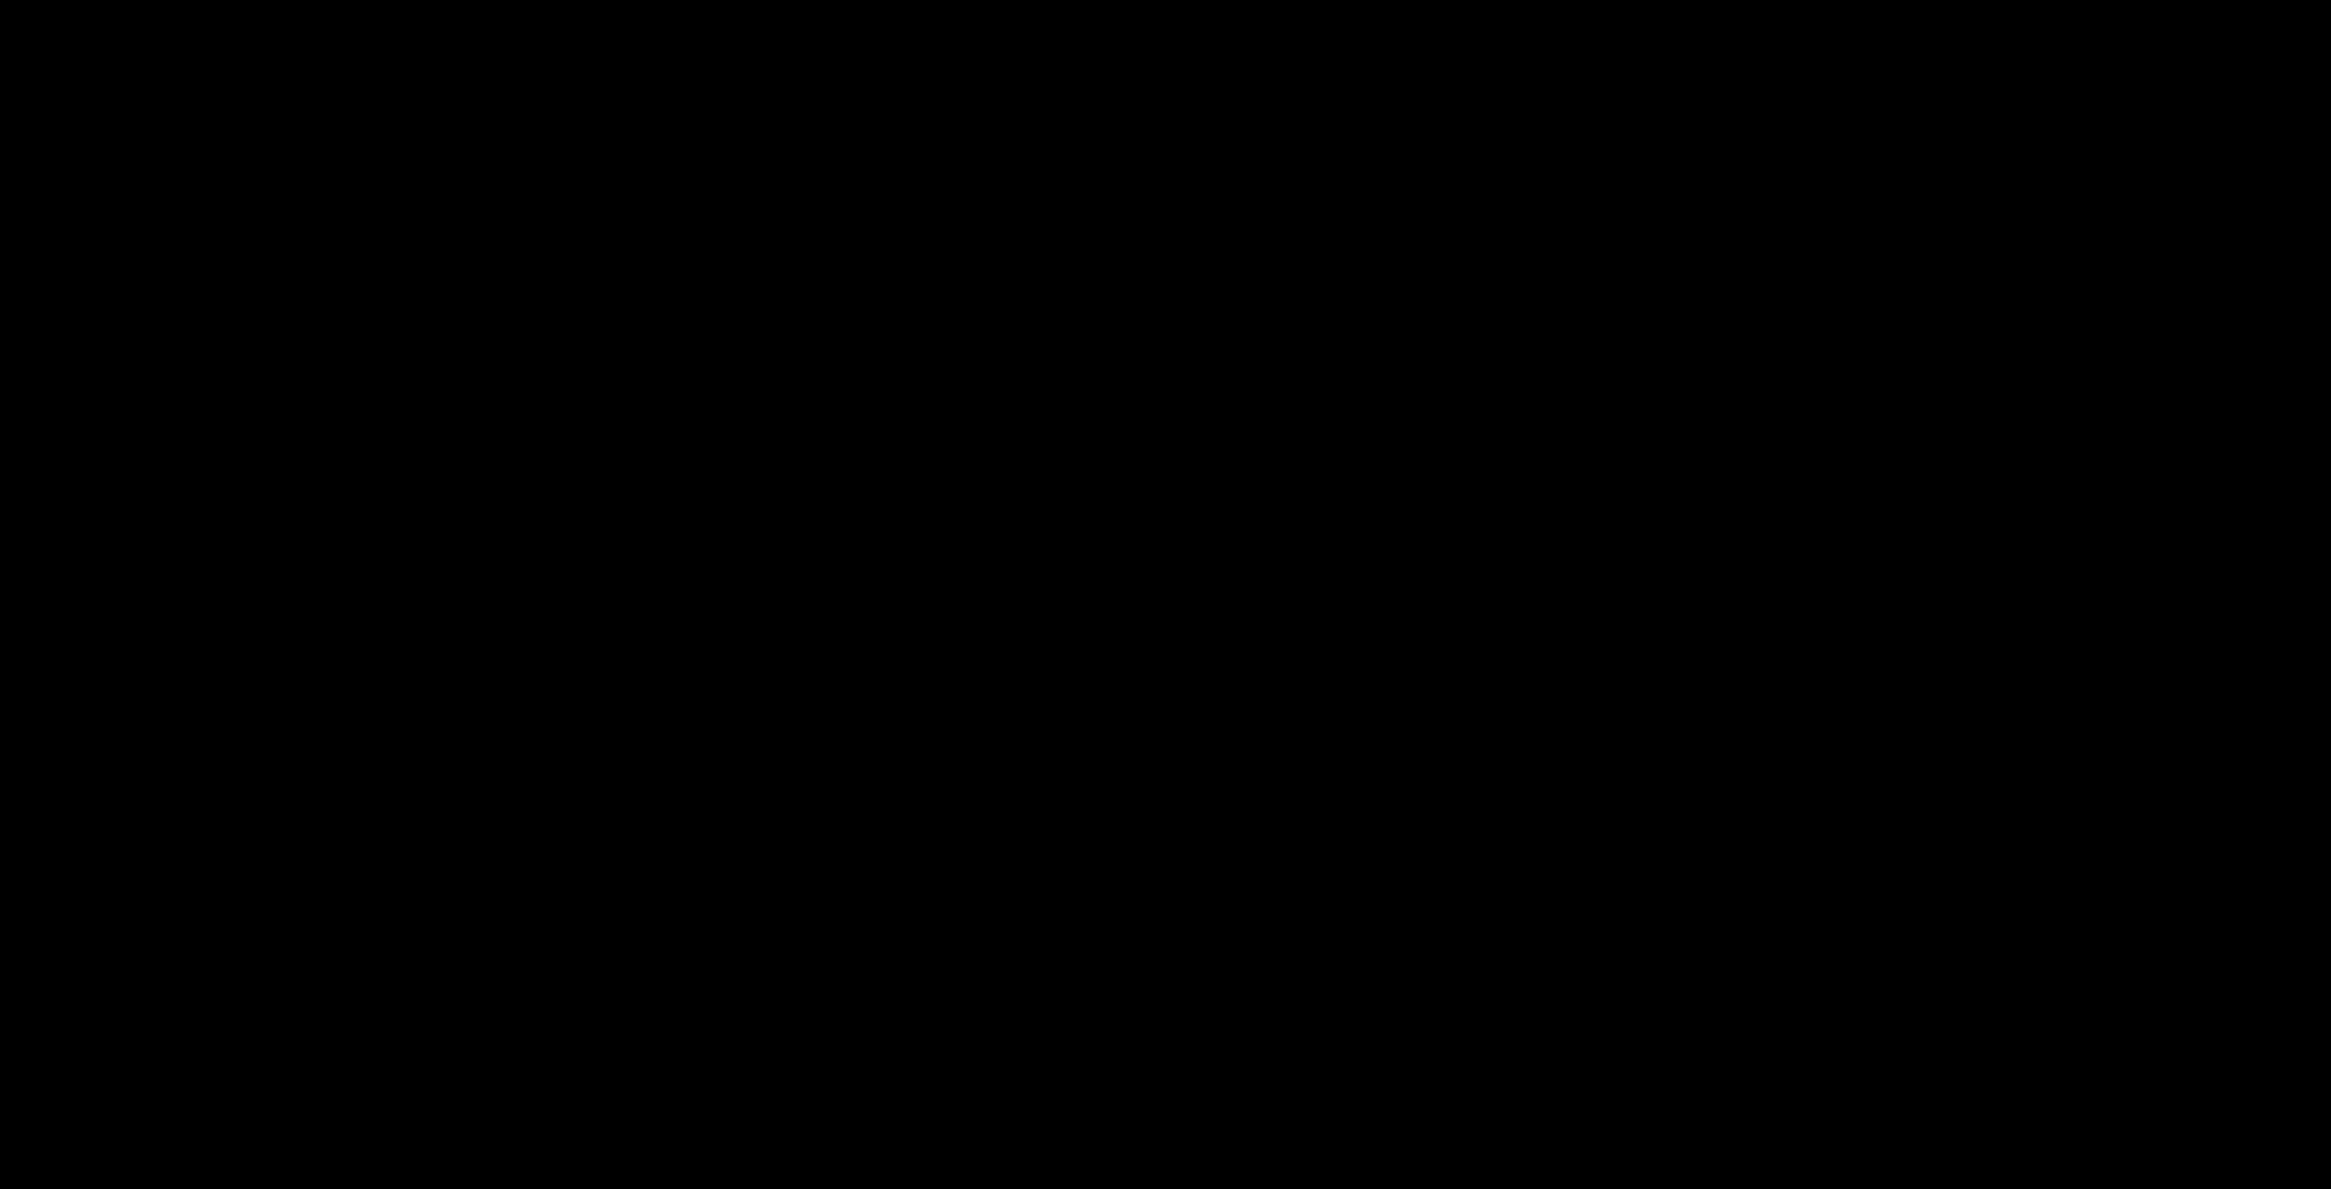 2331x1189 Clipart